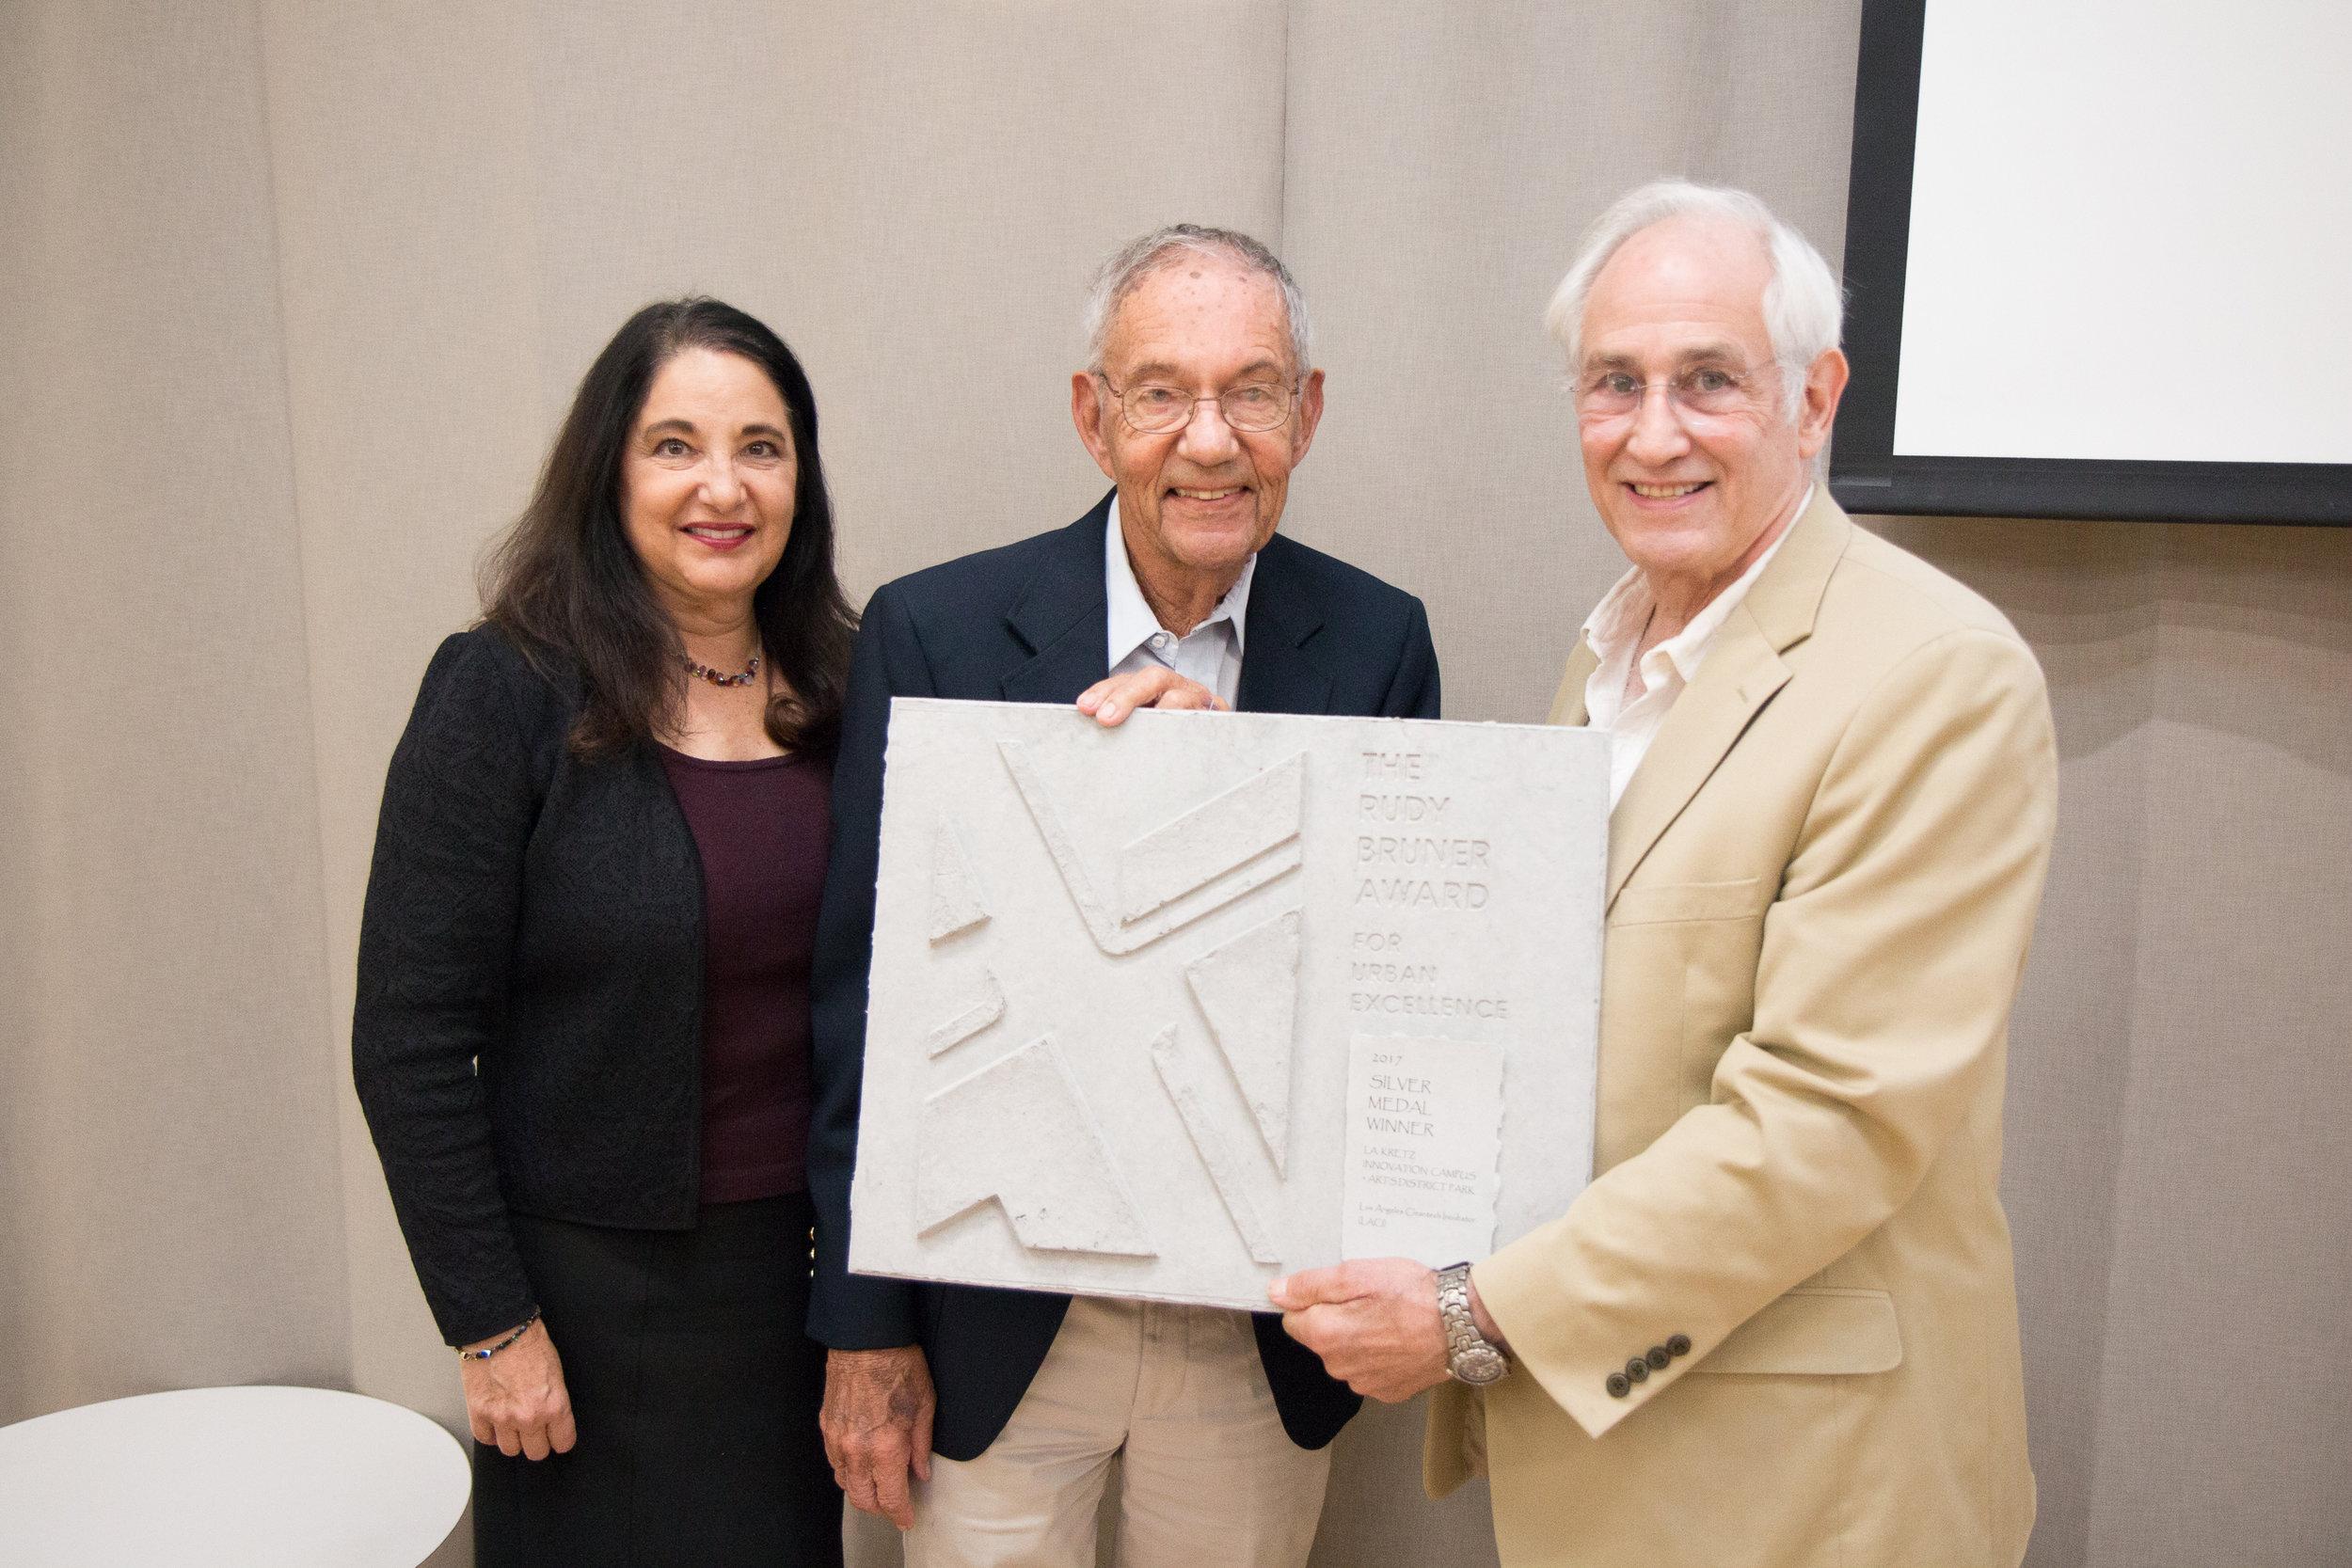 Linda Duttenhaver La Kretz, Morton La Kretz, and Simeon Bruner